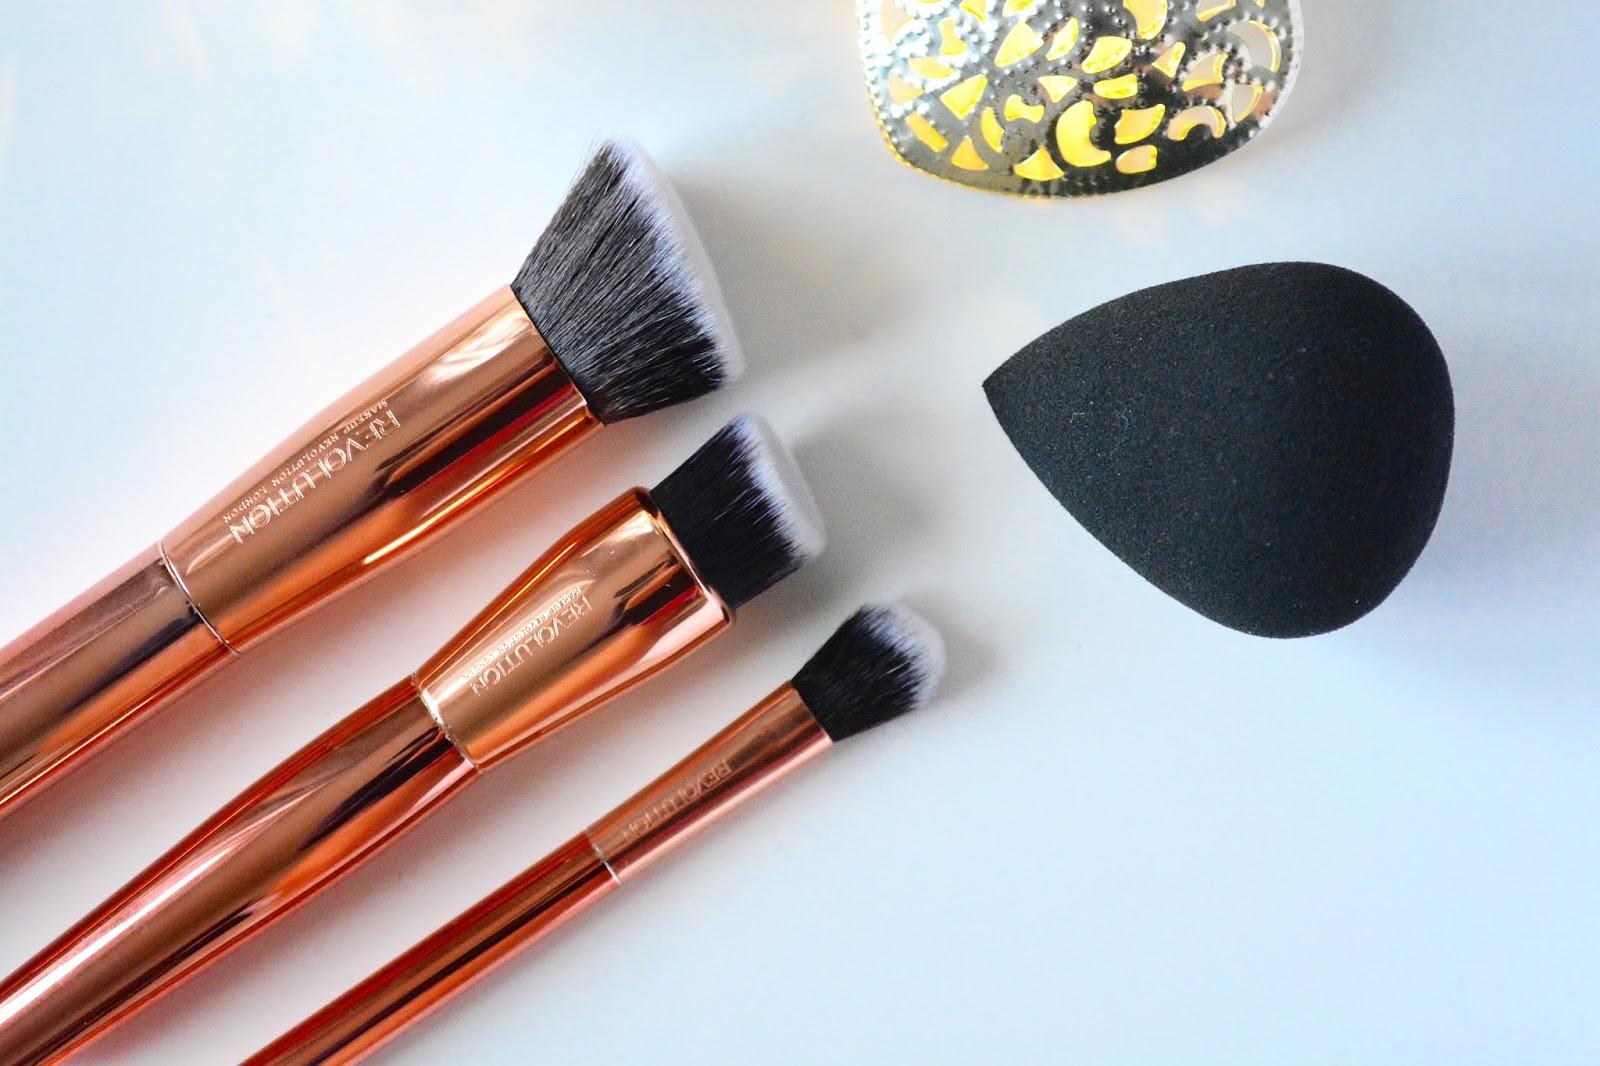 Blend, Contour, Makeup Brushes, Makeup Revolution, Makeup Revolution Makeup Brushes, Sculpt, Ultra Sculpt & Blend Collection,